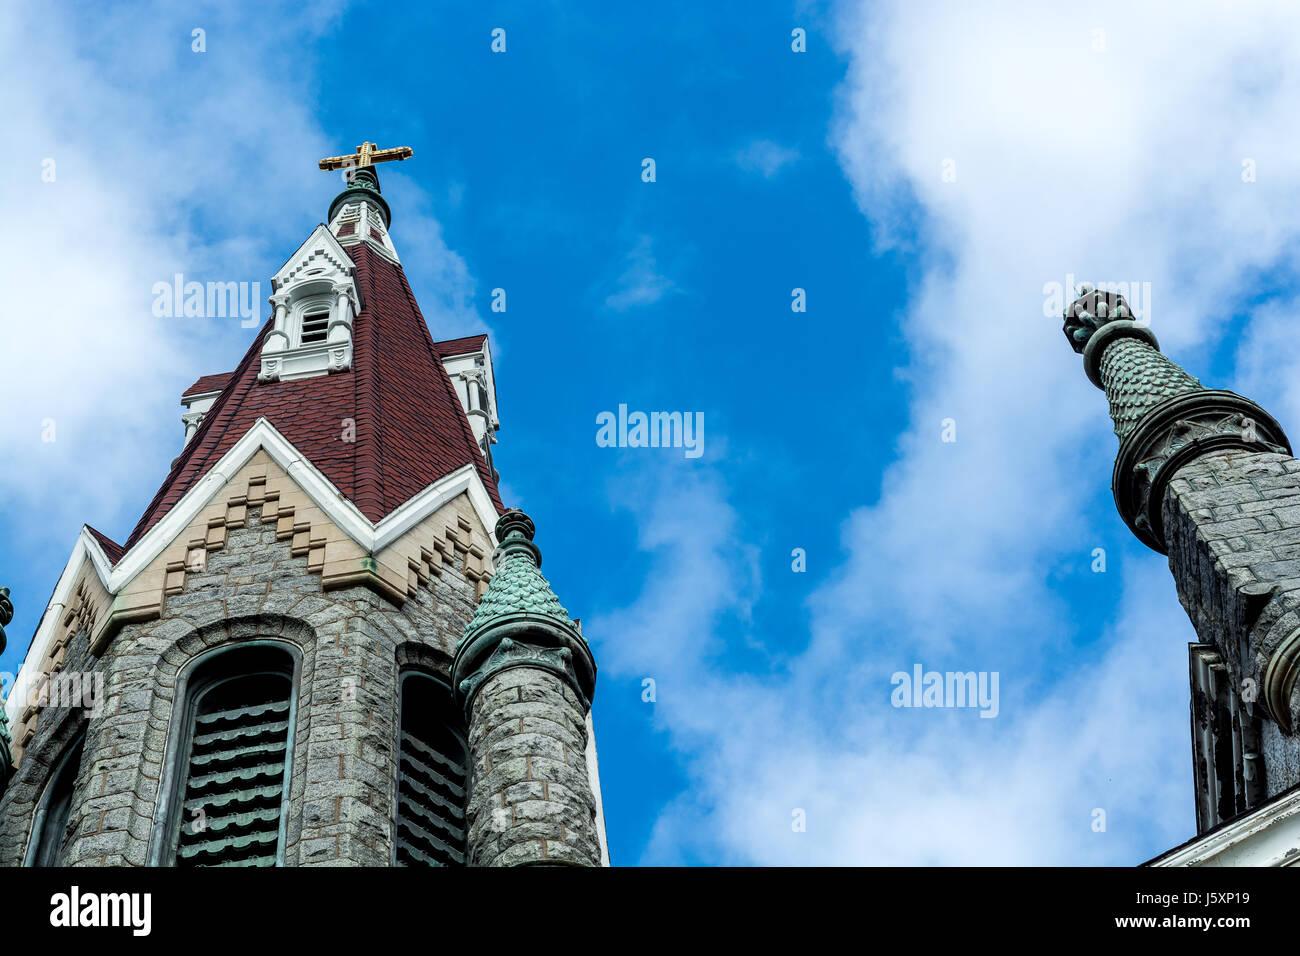 Religious building architecture - church art. Center city Philadelphia. Well built. Catholic  religion facility - Stock Image